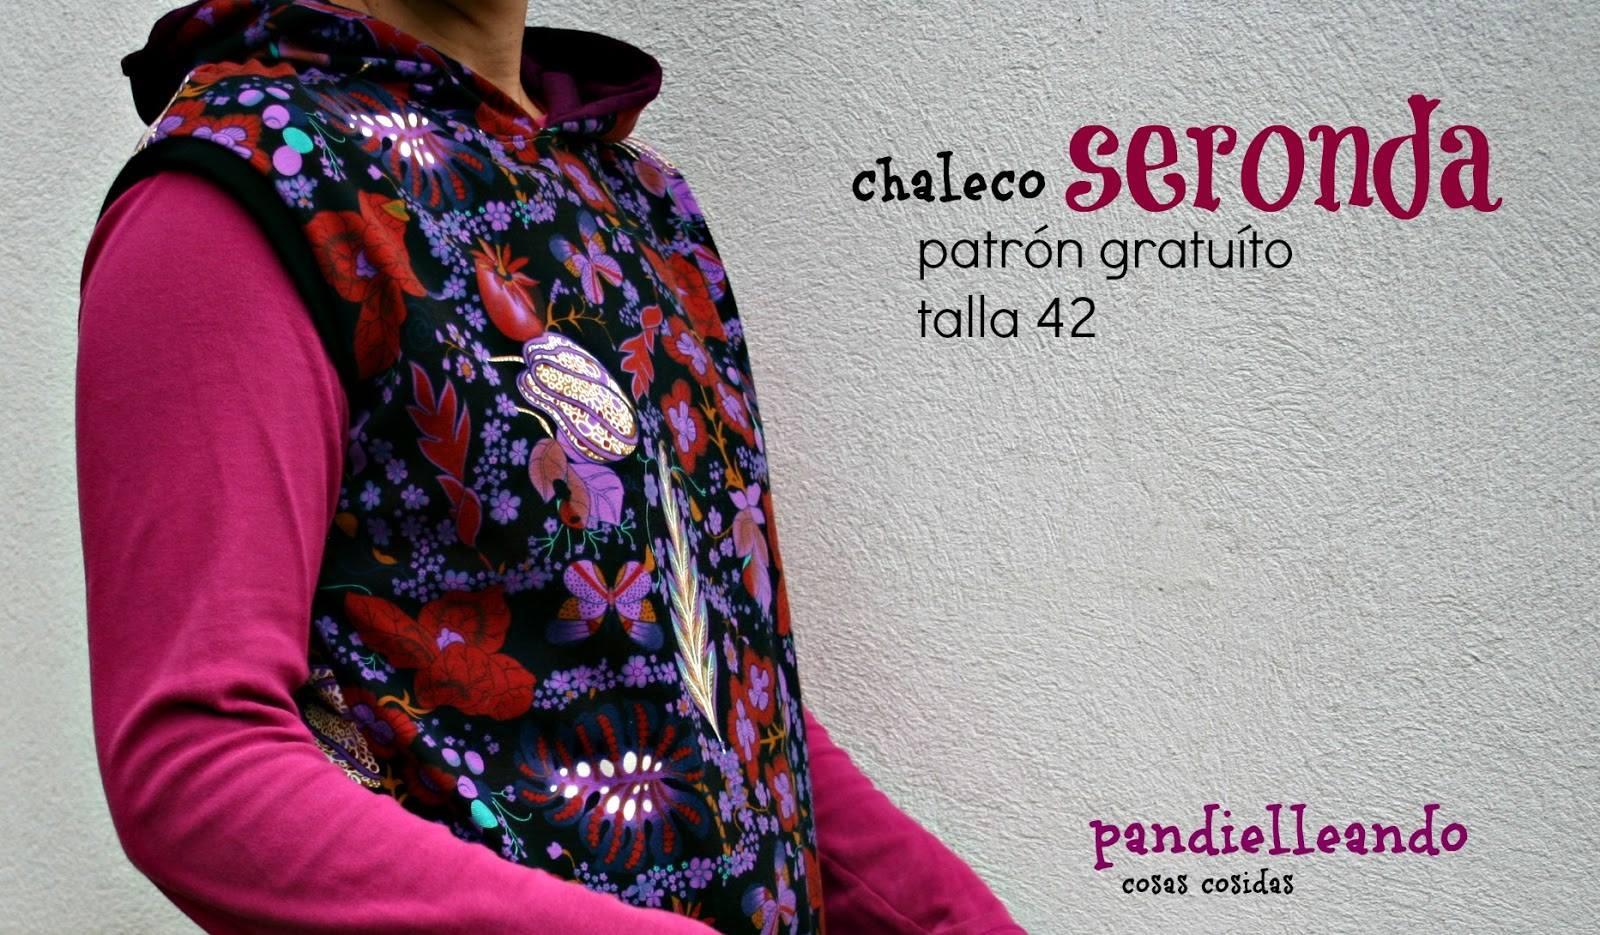 http://pandielleando.blogspot.com.es/2014/09/rums38-chaleco-seronda.html